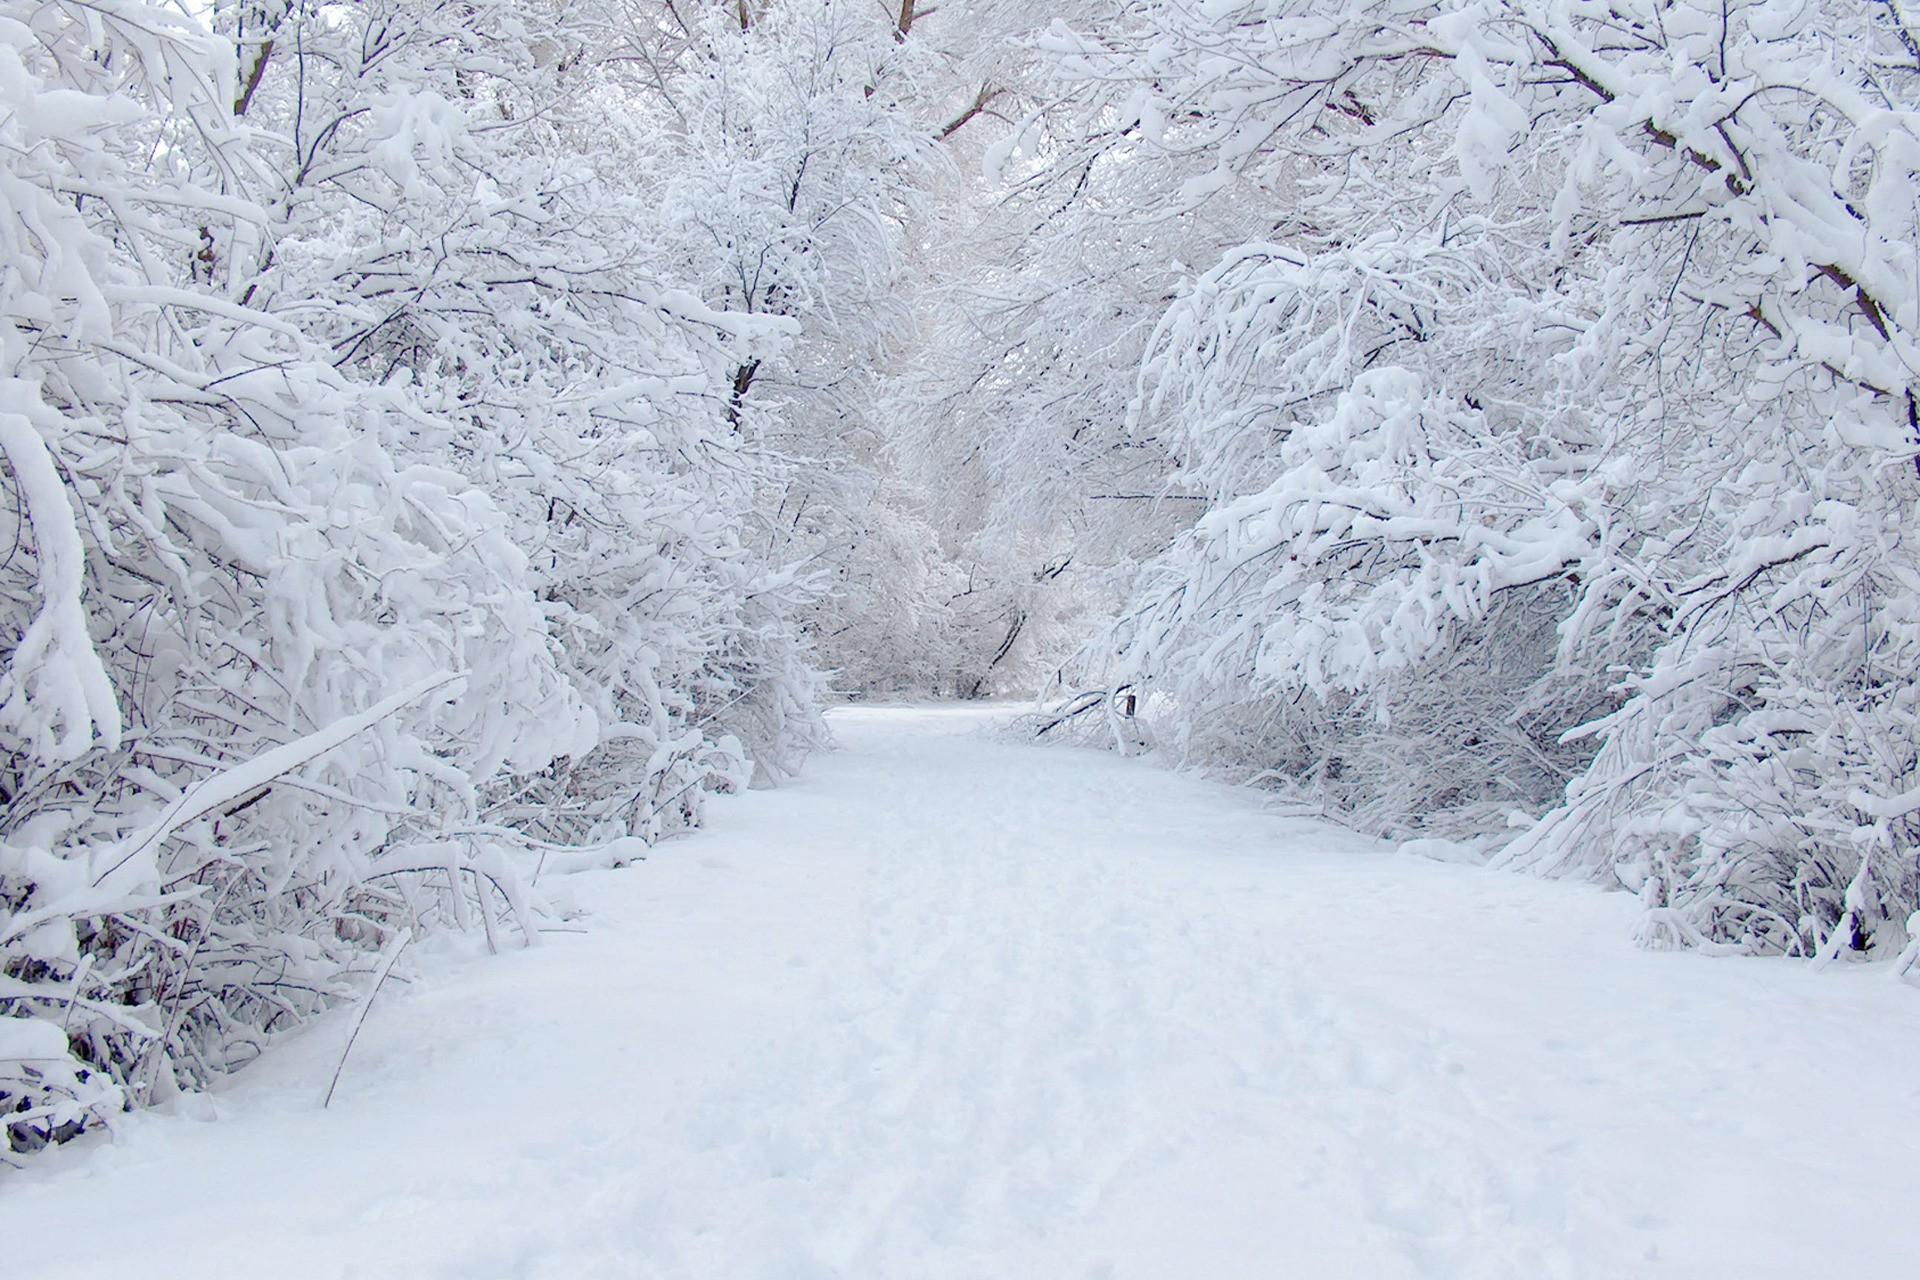 snowy trees wallpaper 32370